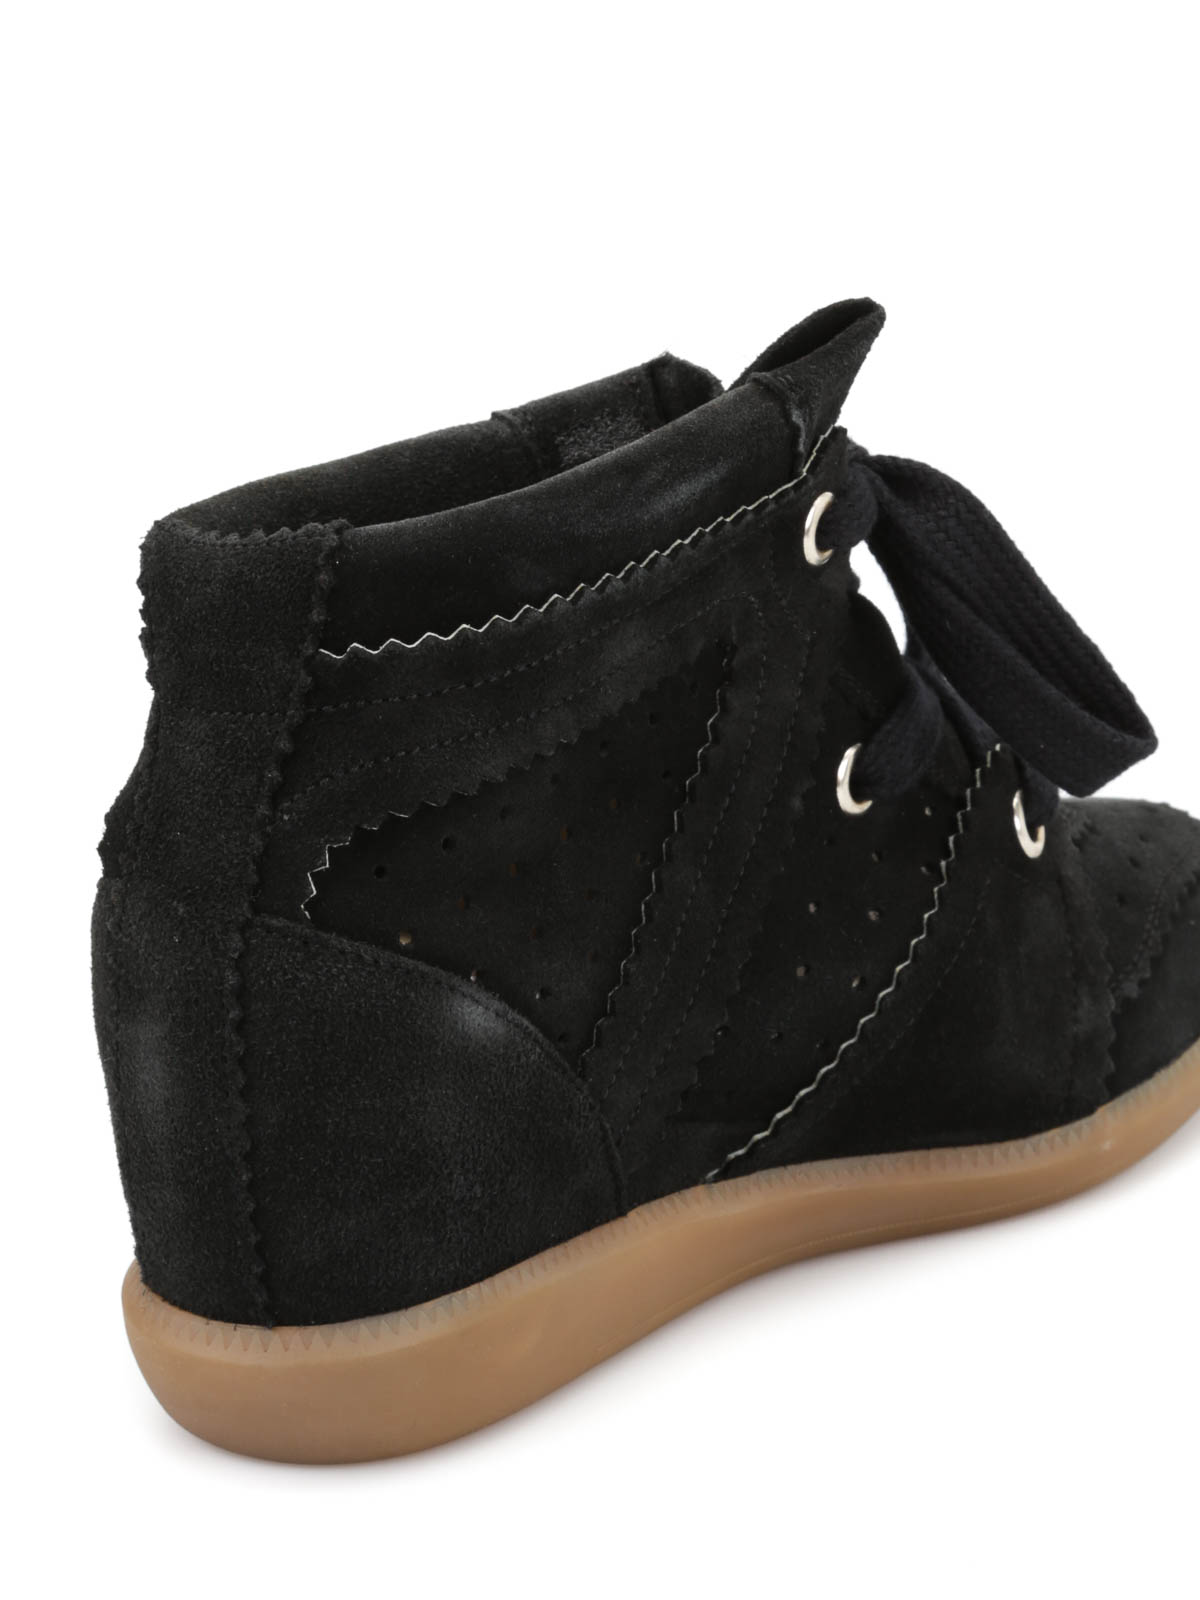 Isabel marant sneakers shop online italia